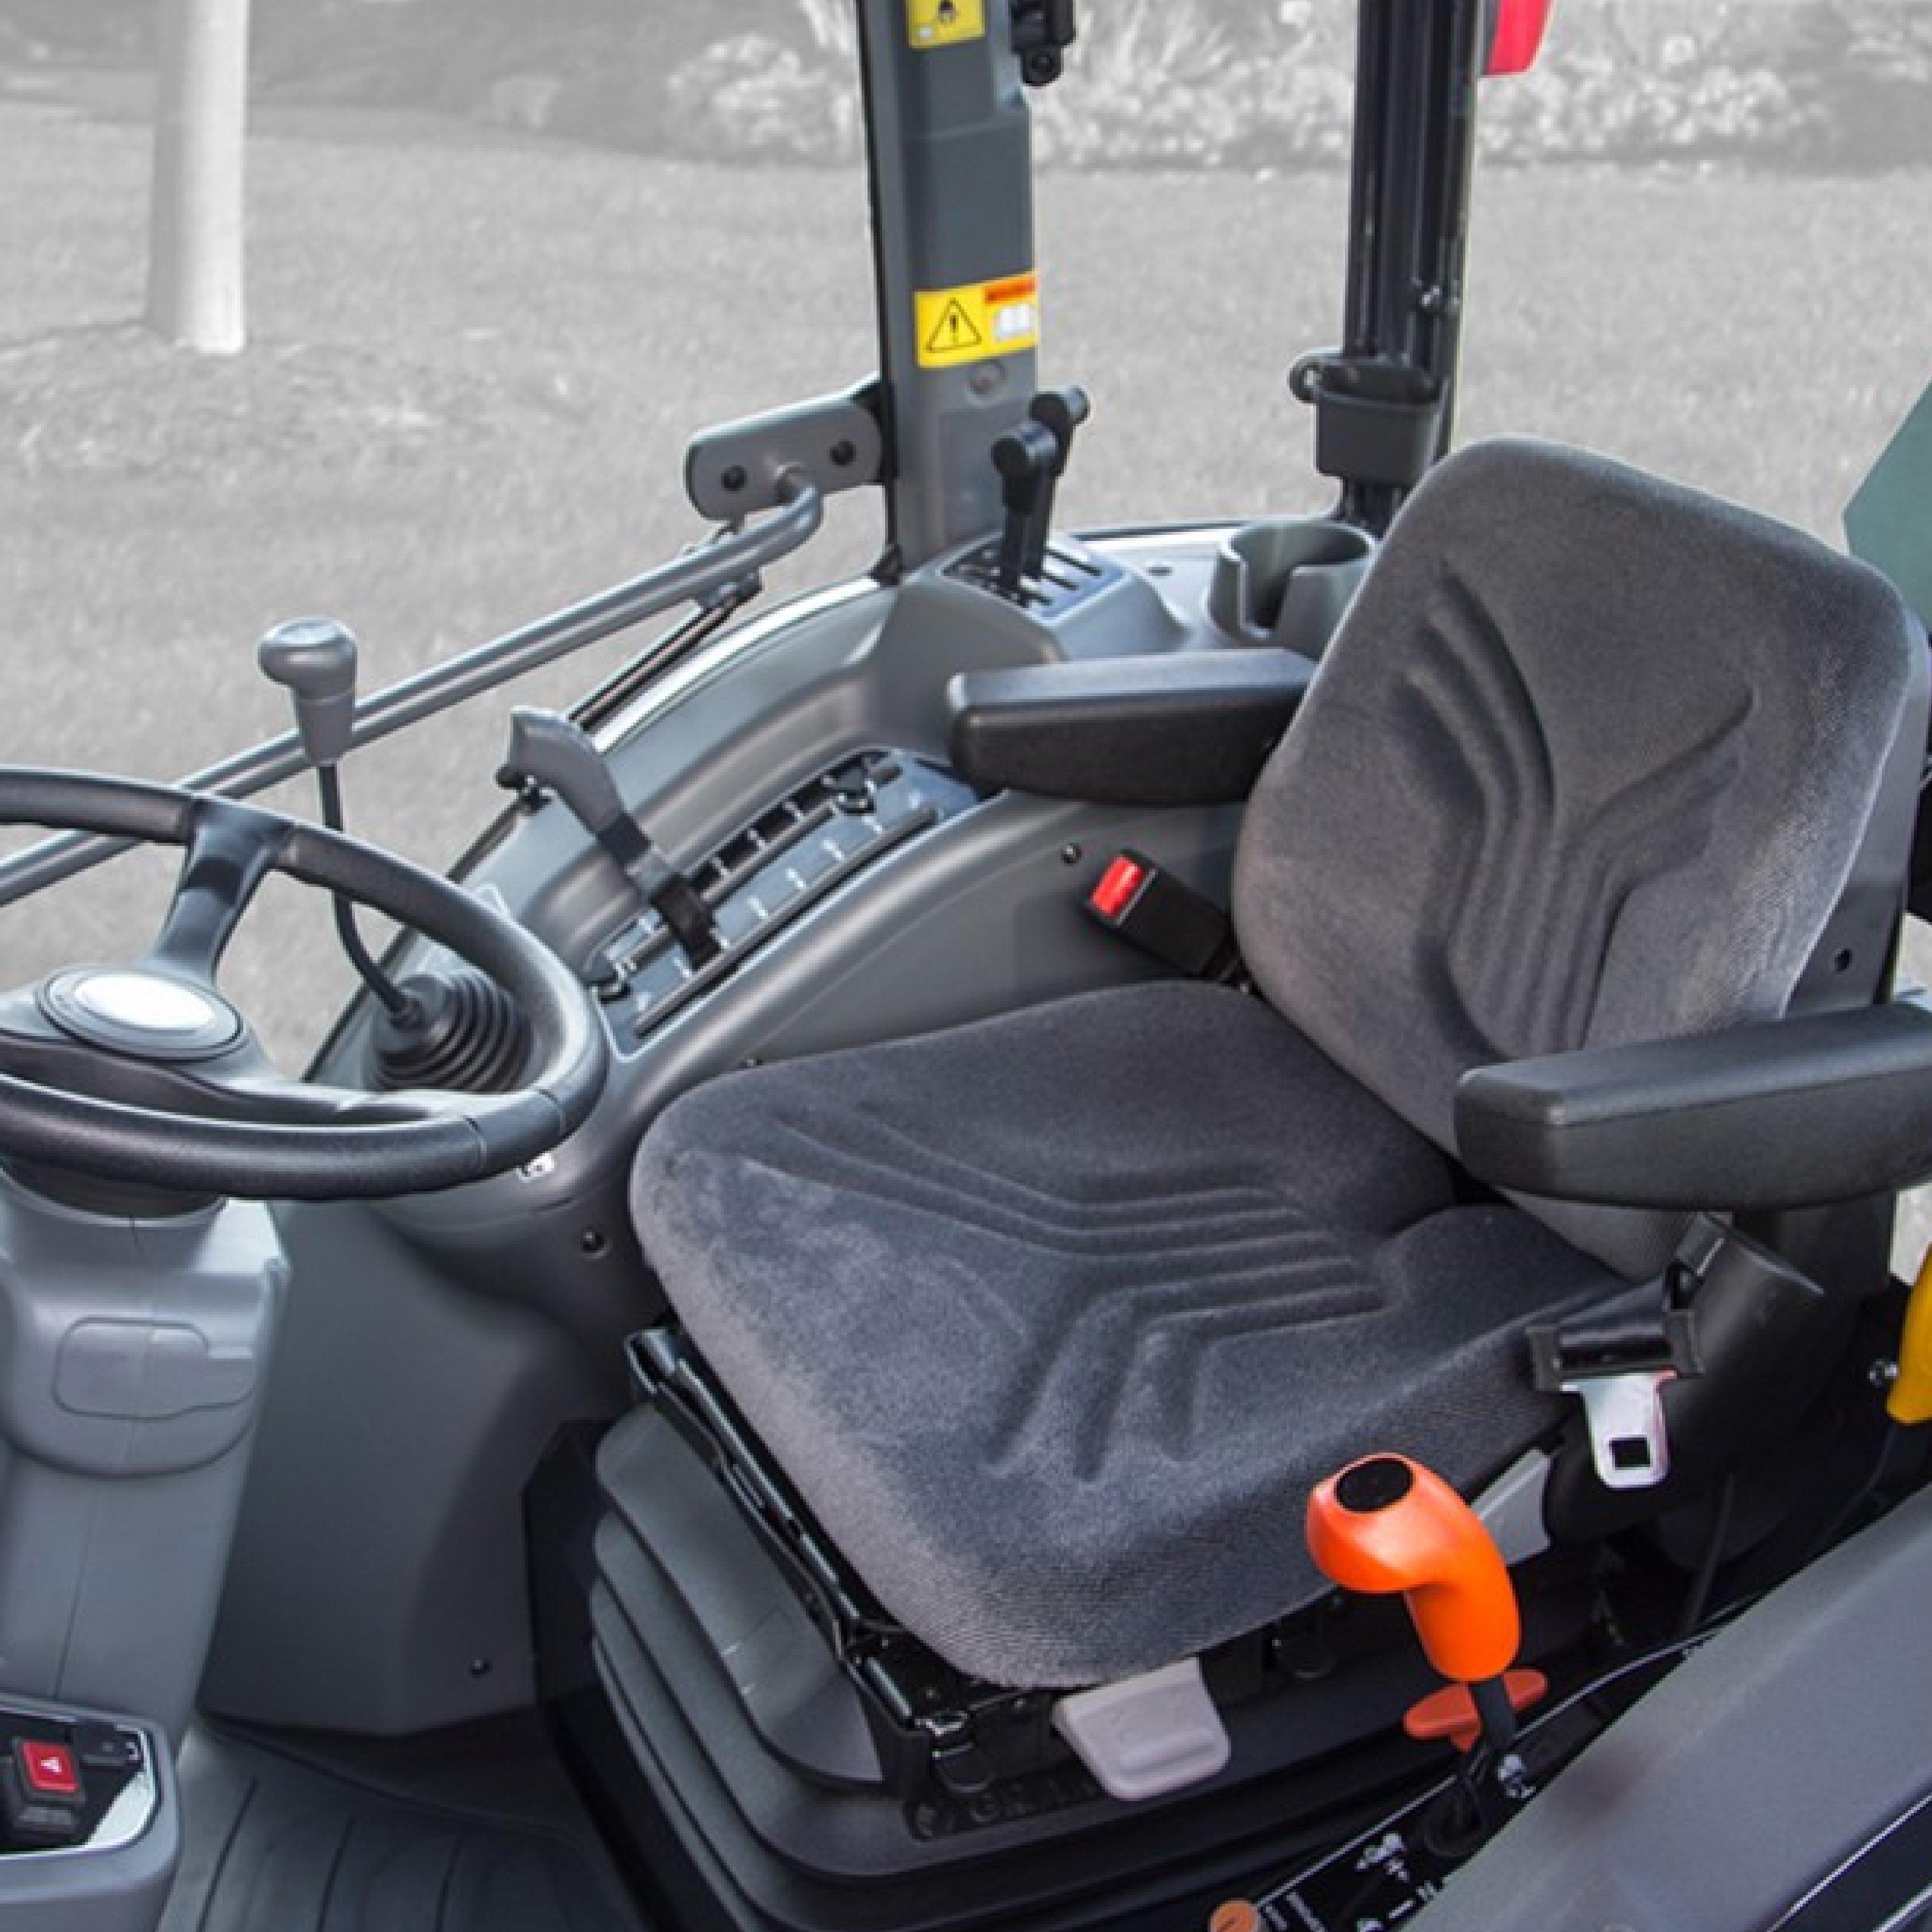 Massey Ferguson 1700M Series Tractors Picture